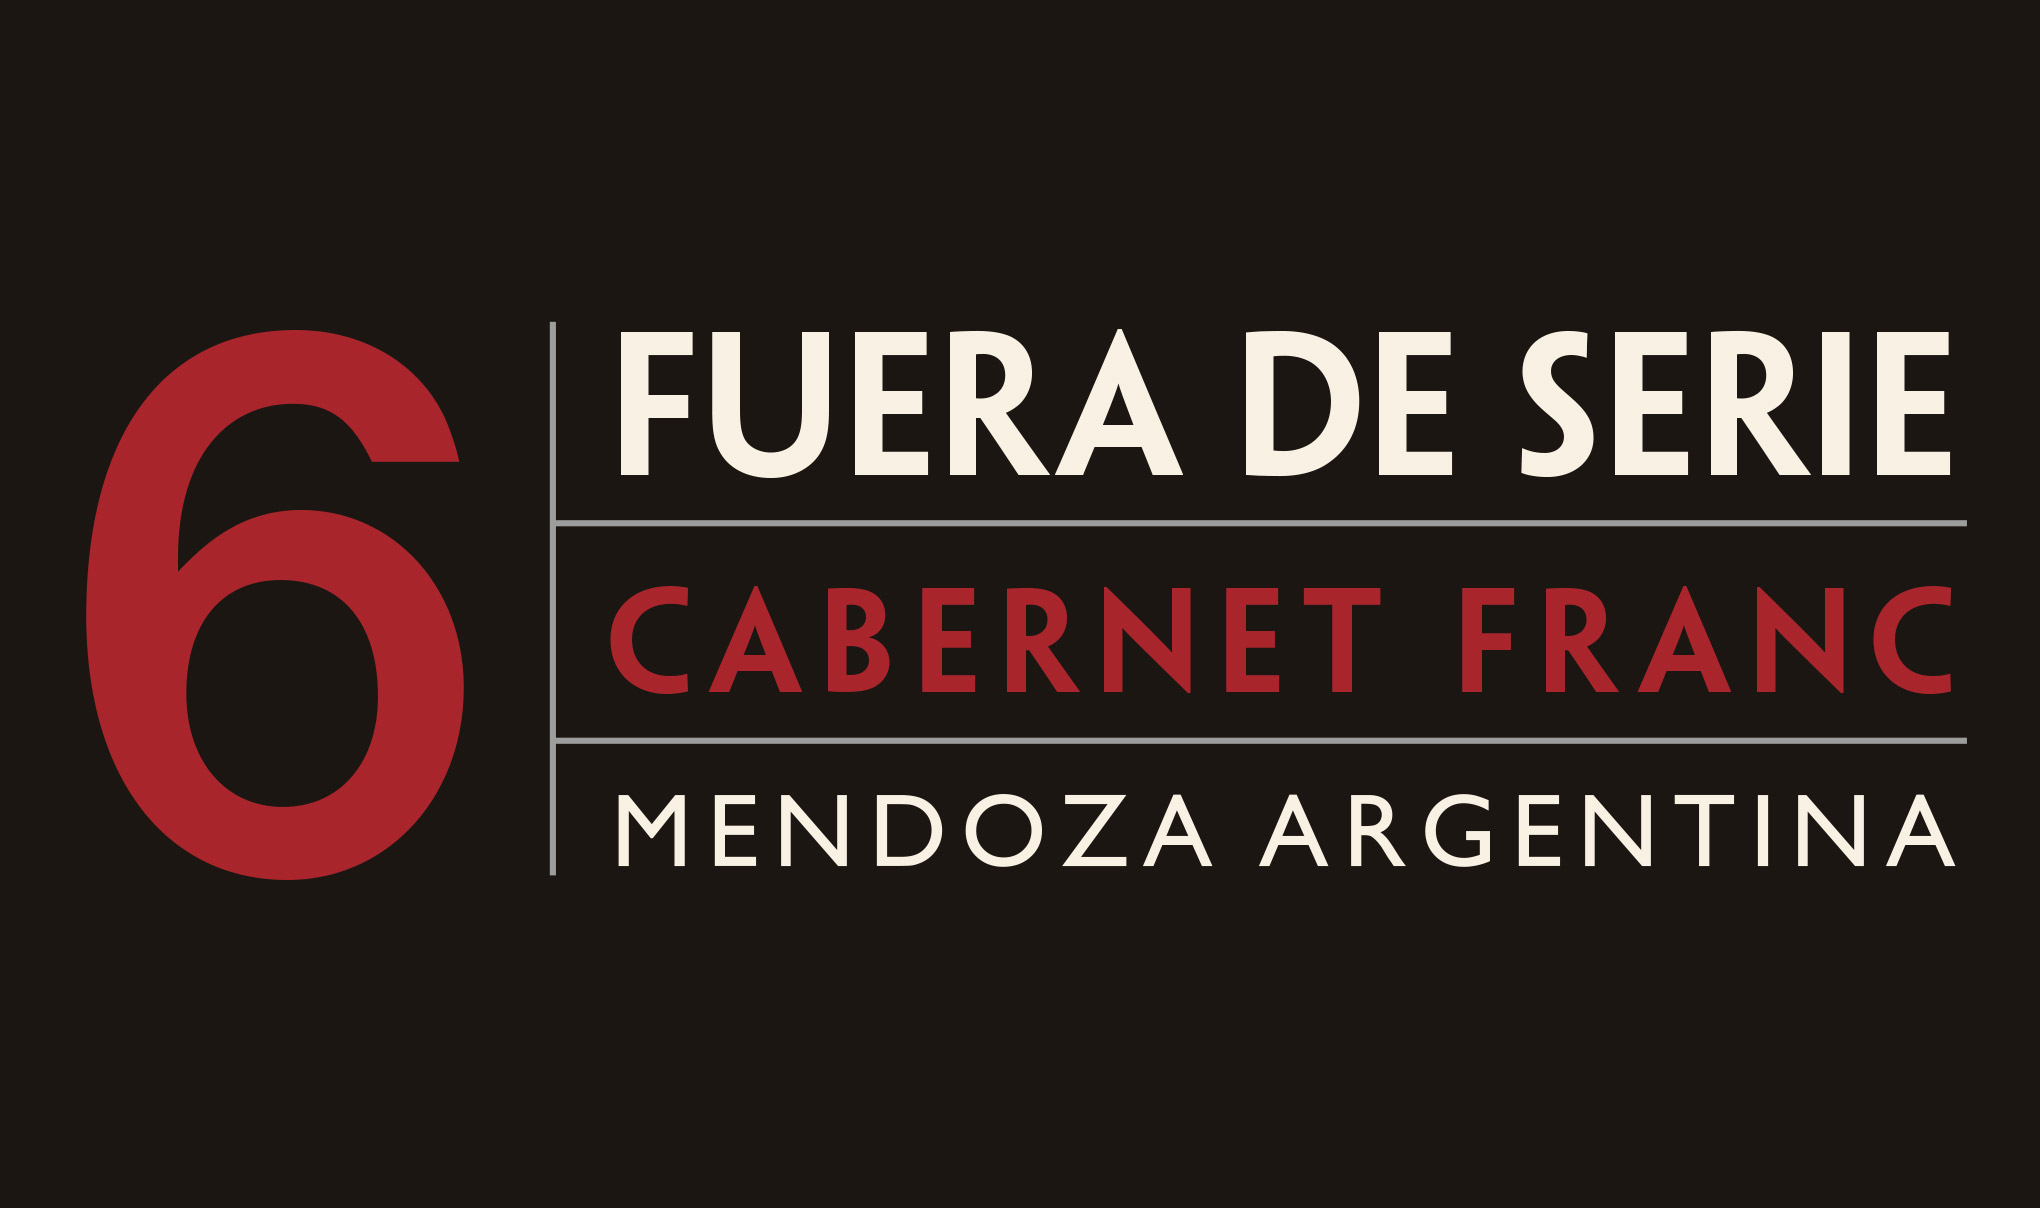 Fuera De Serie wine label tab - Cabernet Franc